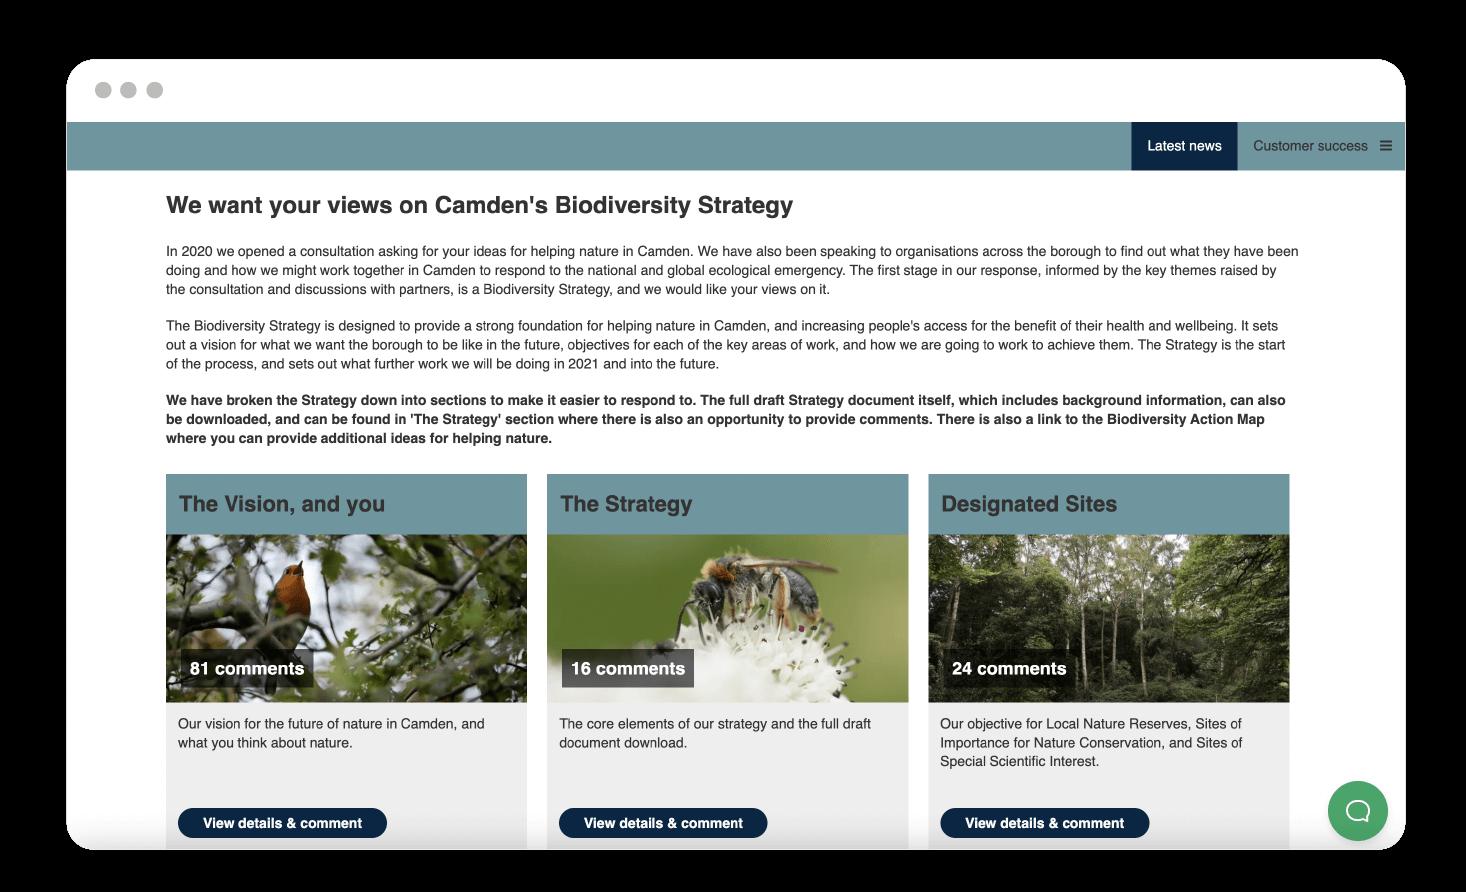 Camden Biodiversity consultation